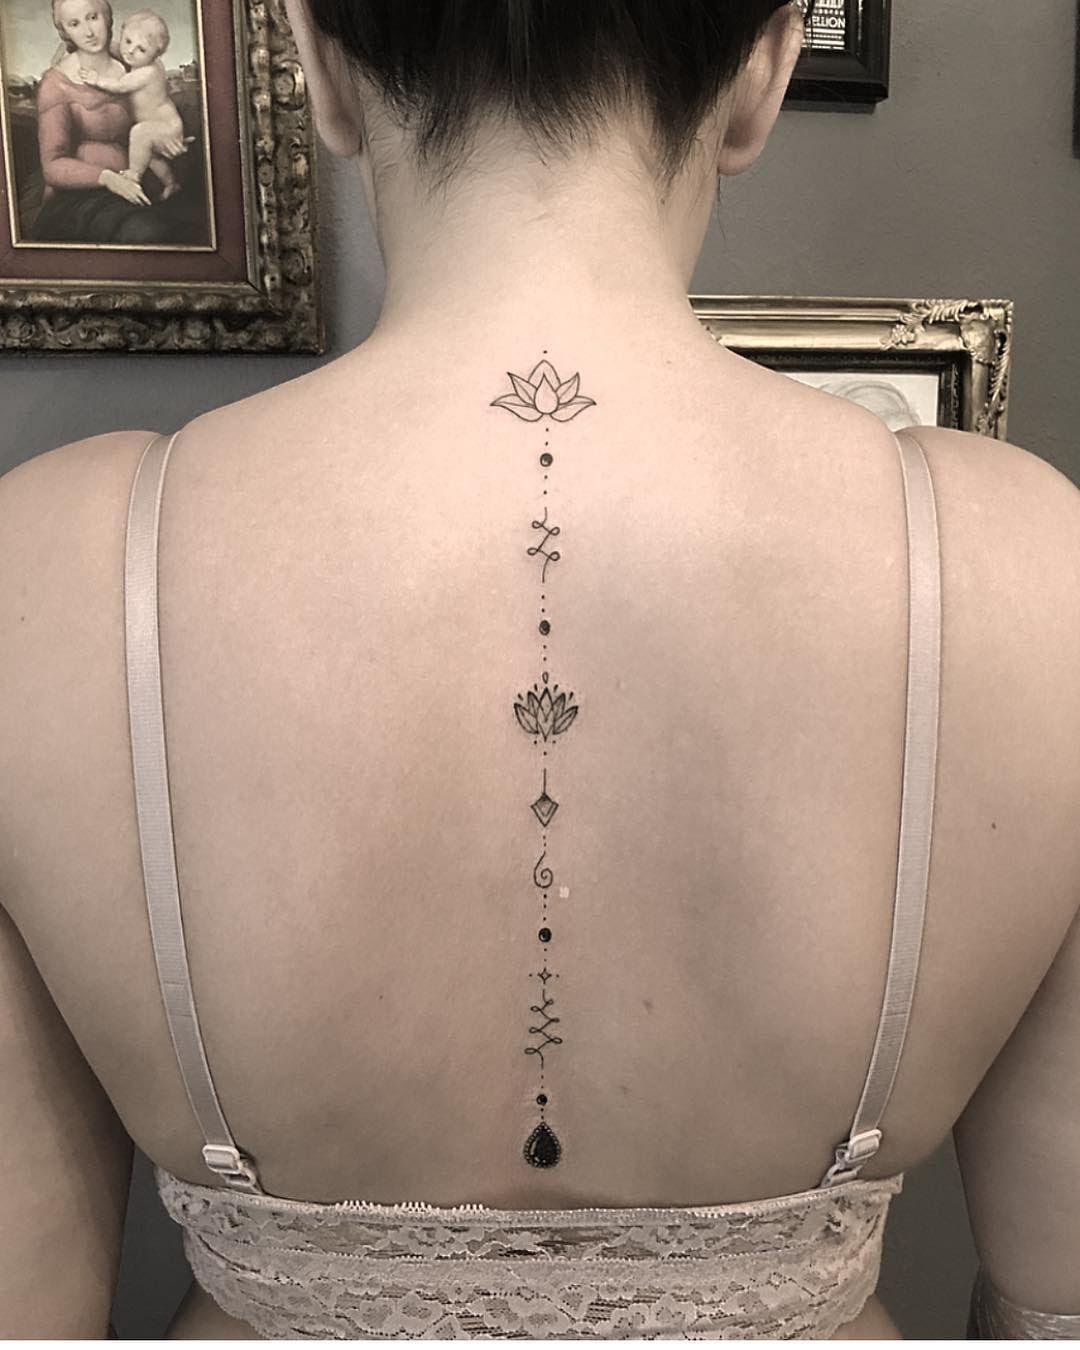 Unalome Jewelry Tattoo Tattoos Lotus Lotustattoo Jewelrytattoo Backtattoo Tattoosforgirls In Spine Tattoos For Women Spine Tattoos Neck Tattoos Women